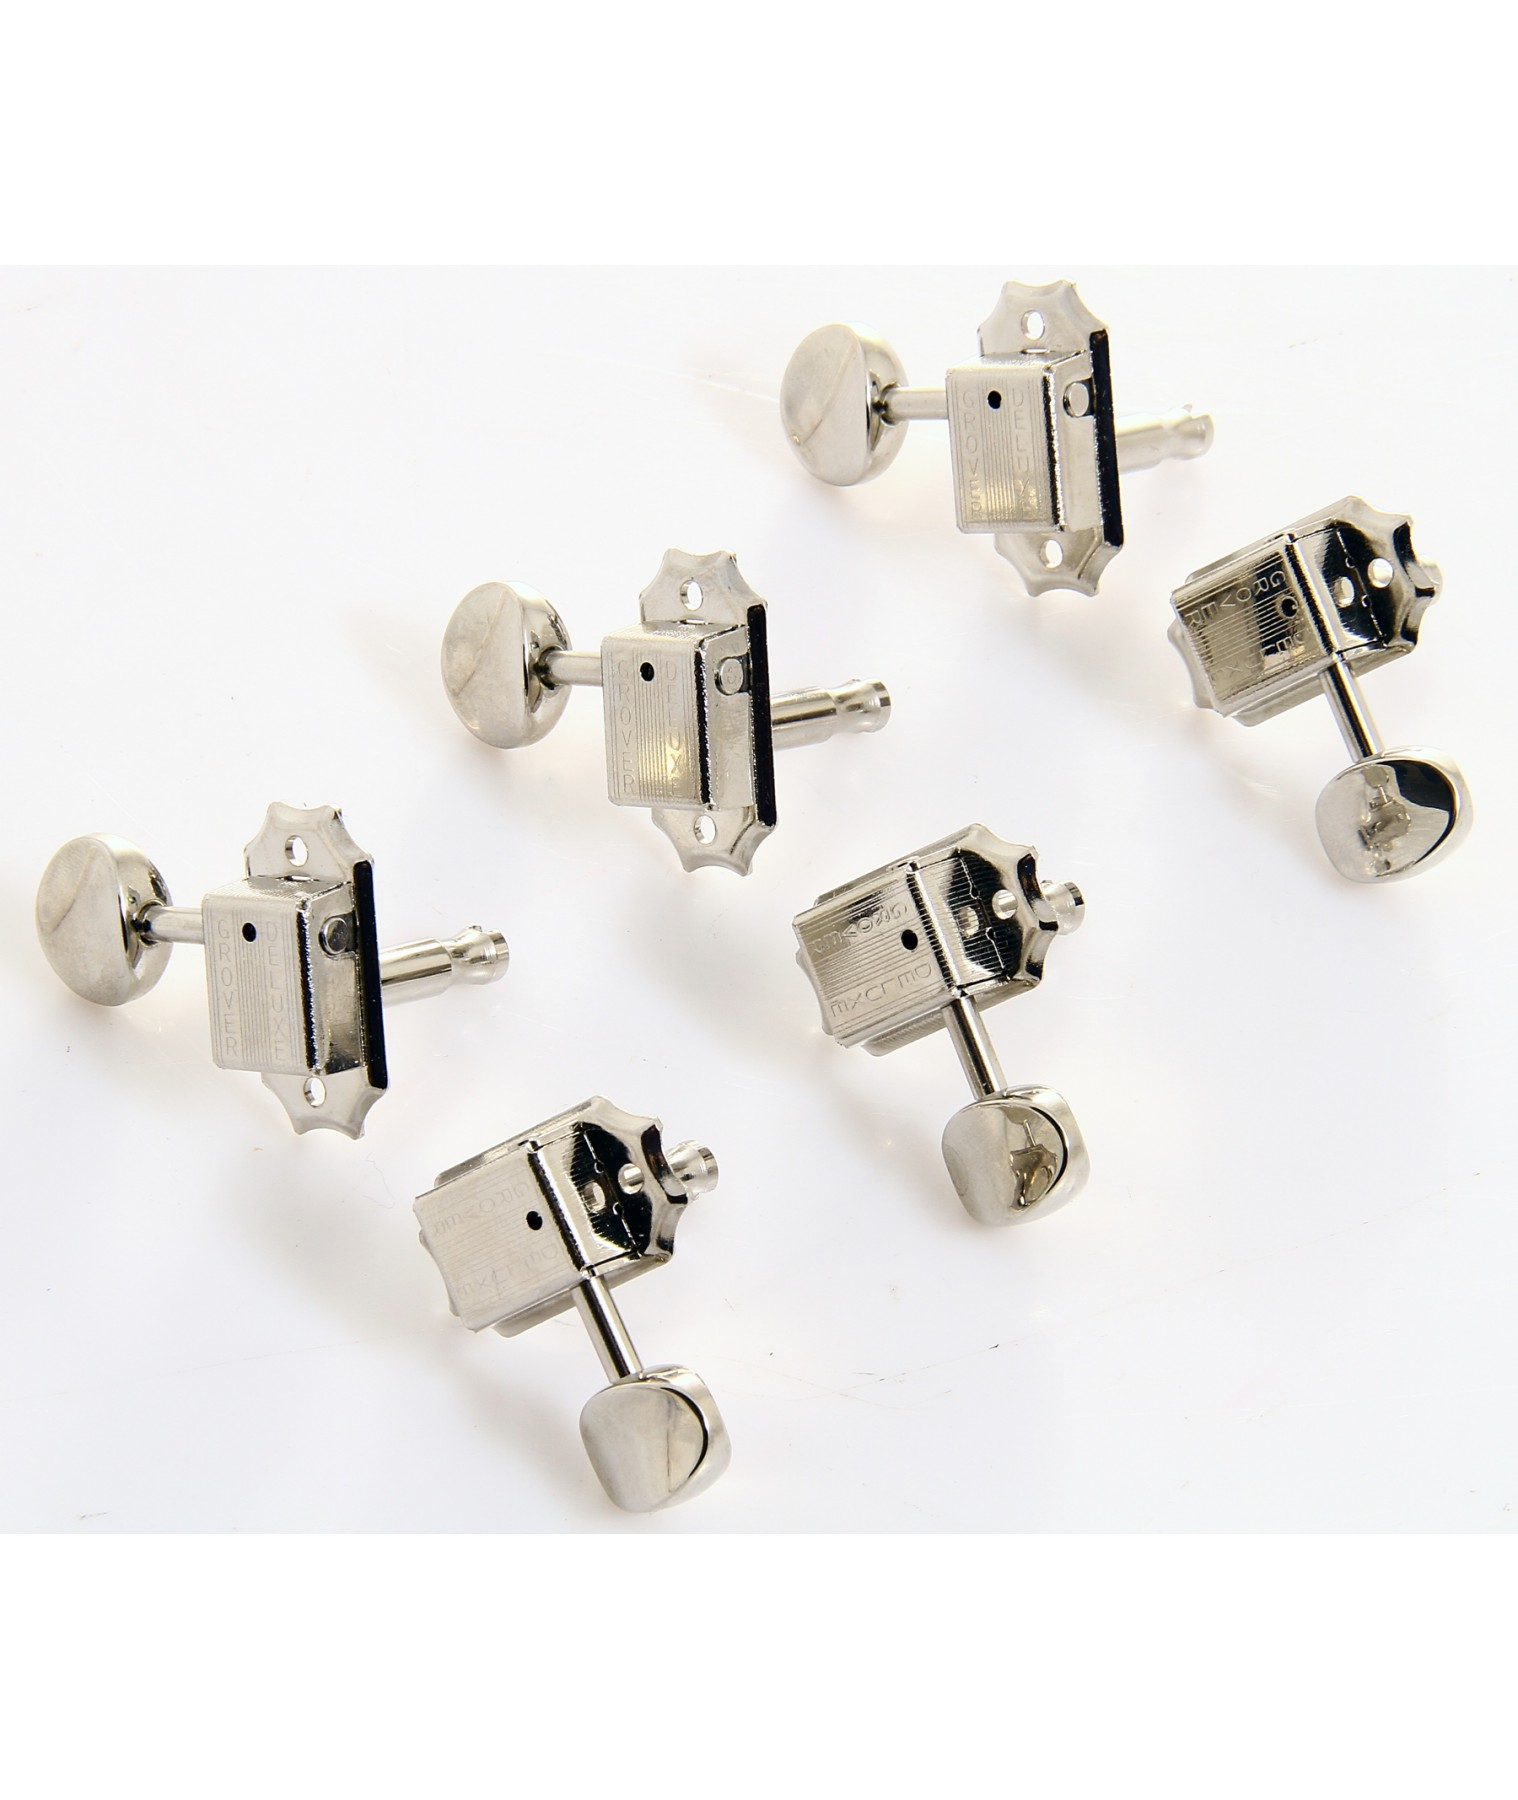 grover deluxe vintage series 3 a side kluson button 14 1 ratio nickel 133n. Black Bedroom Furniture Sets. Home Design Ideas